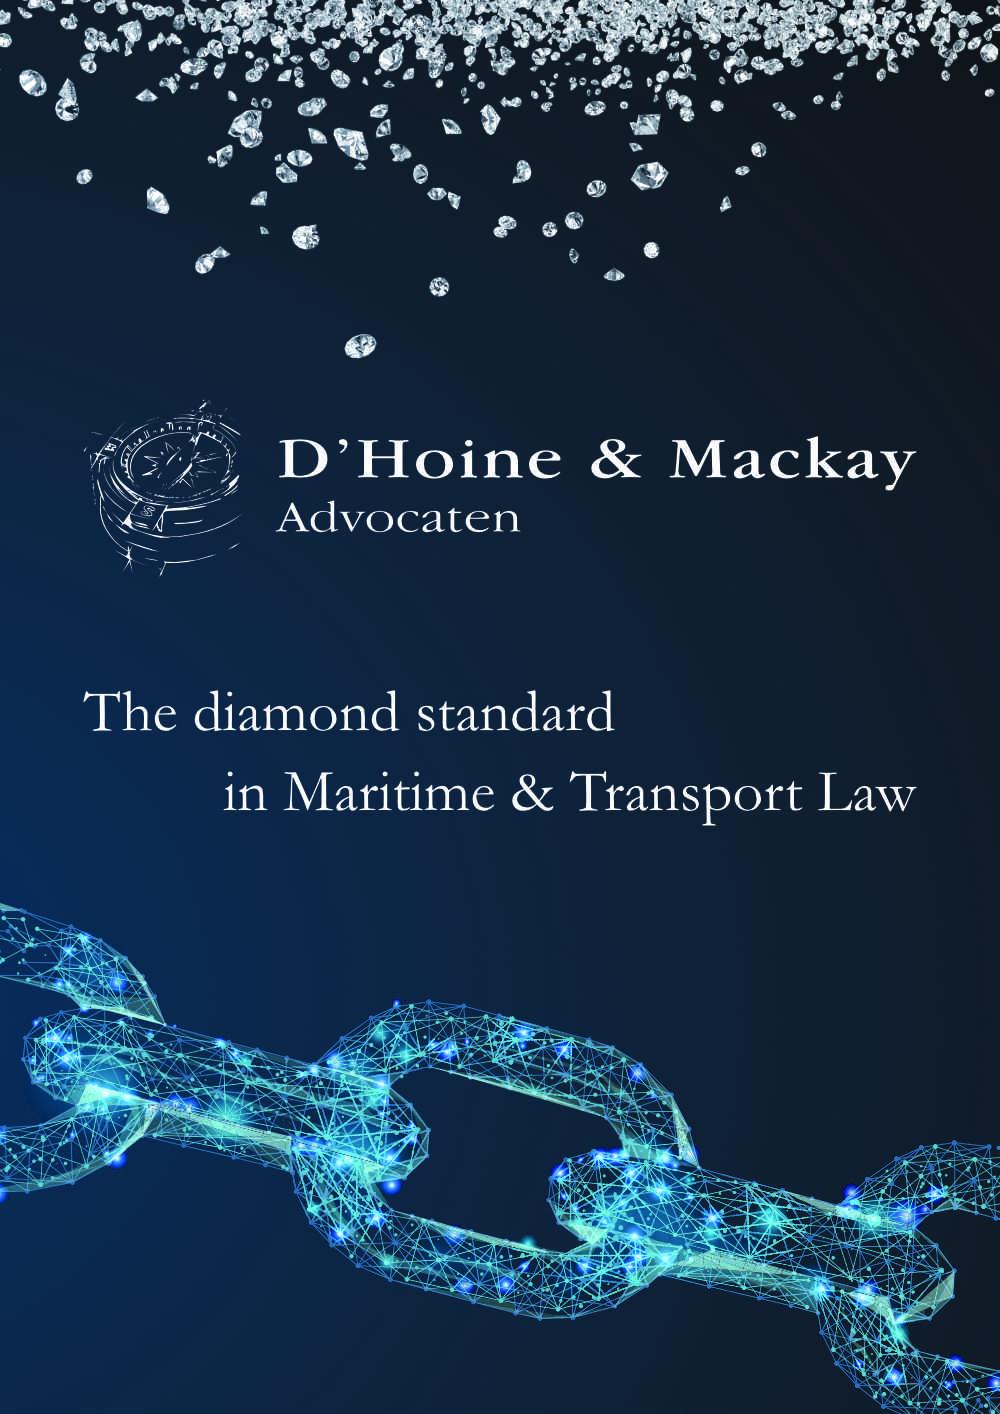 DHoine-Mackay-Advert-2018